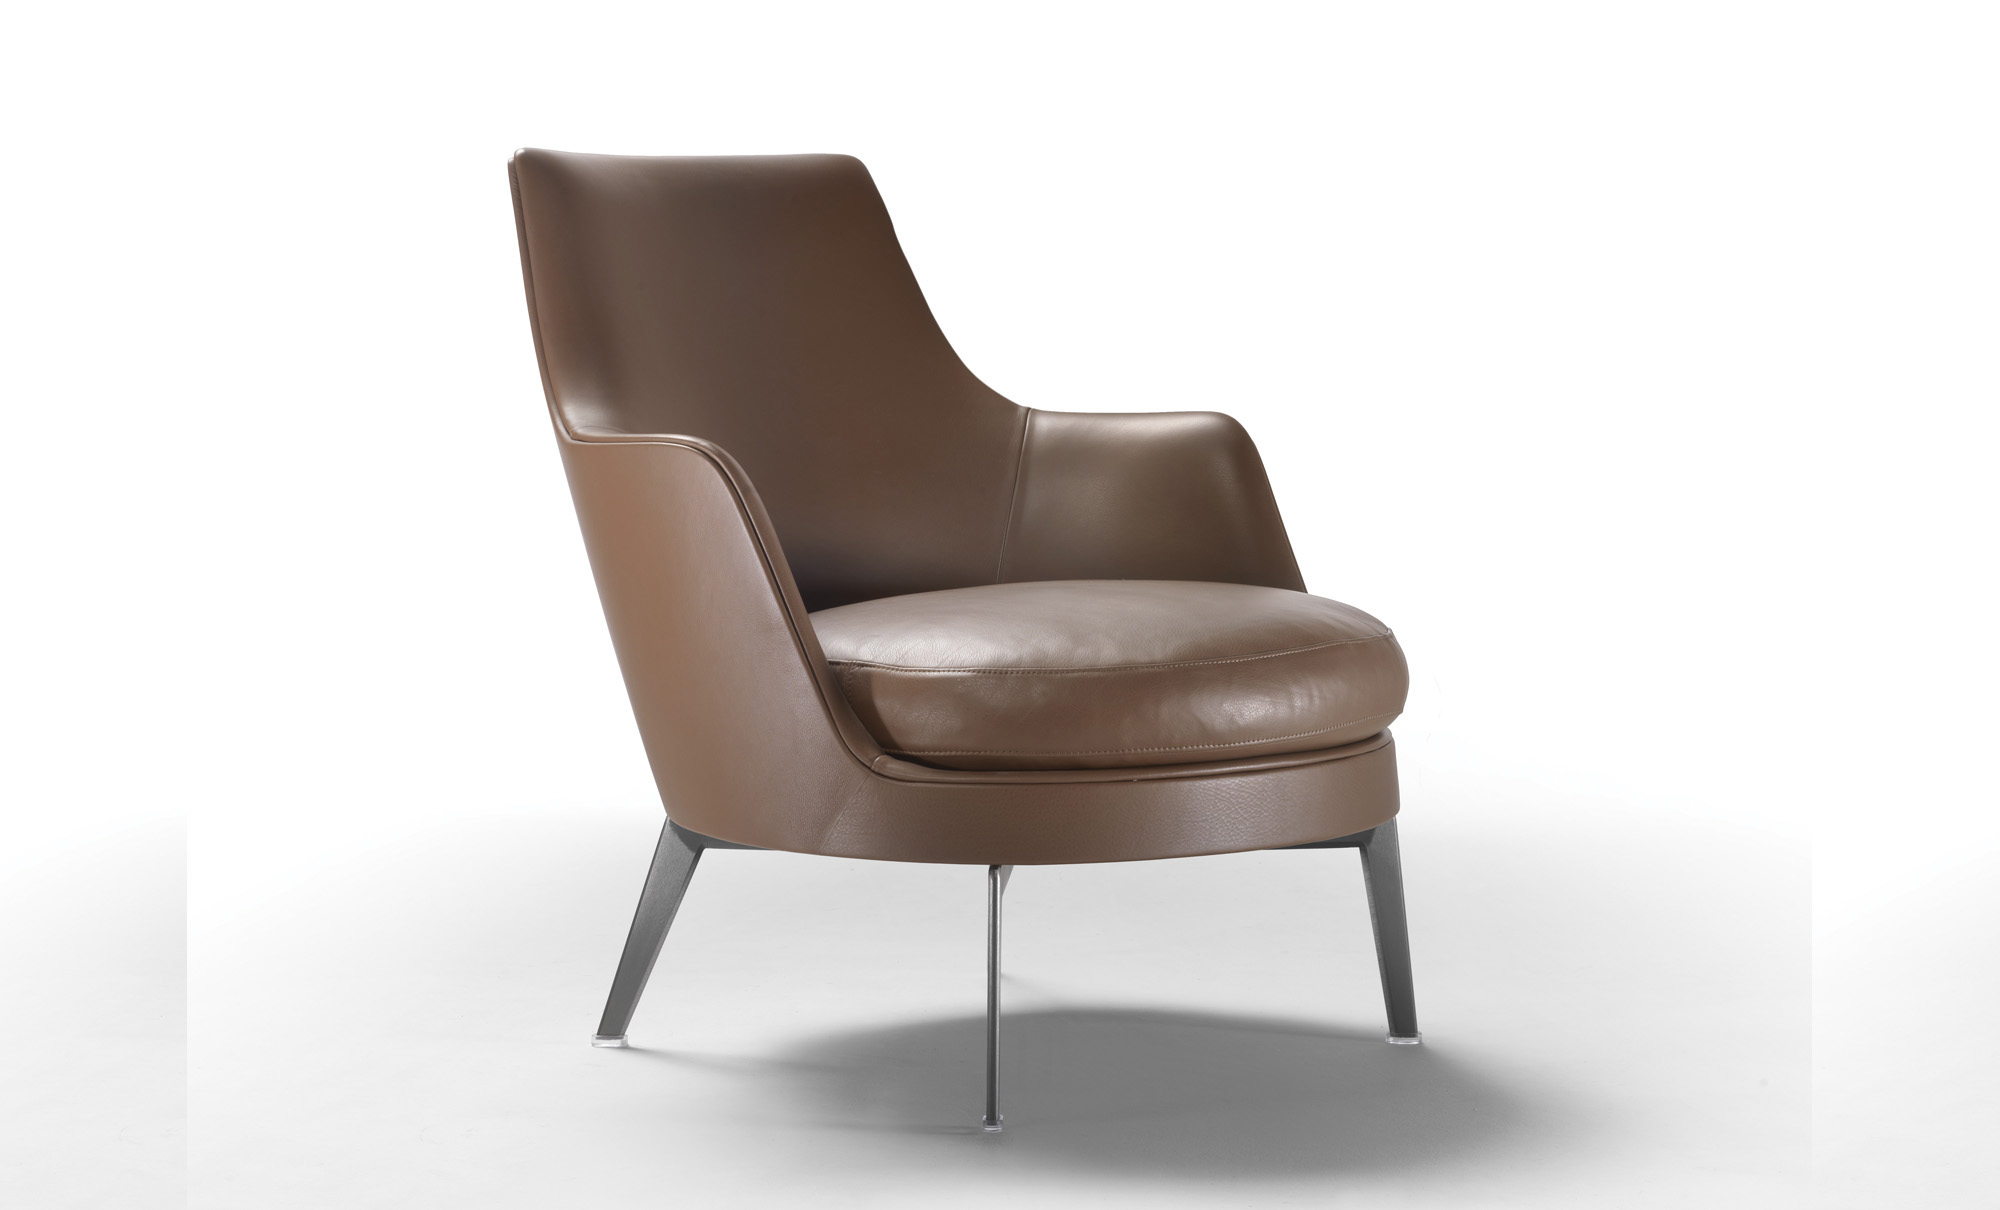 Guscio Soft Lounge Chairs Fanuli Furniture